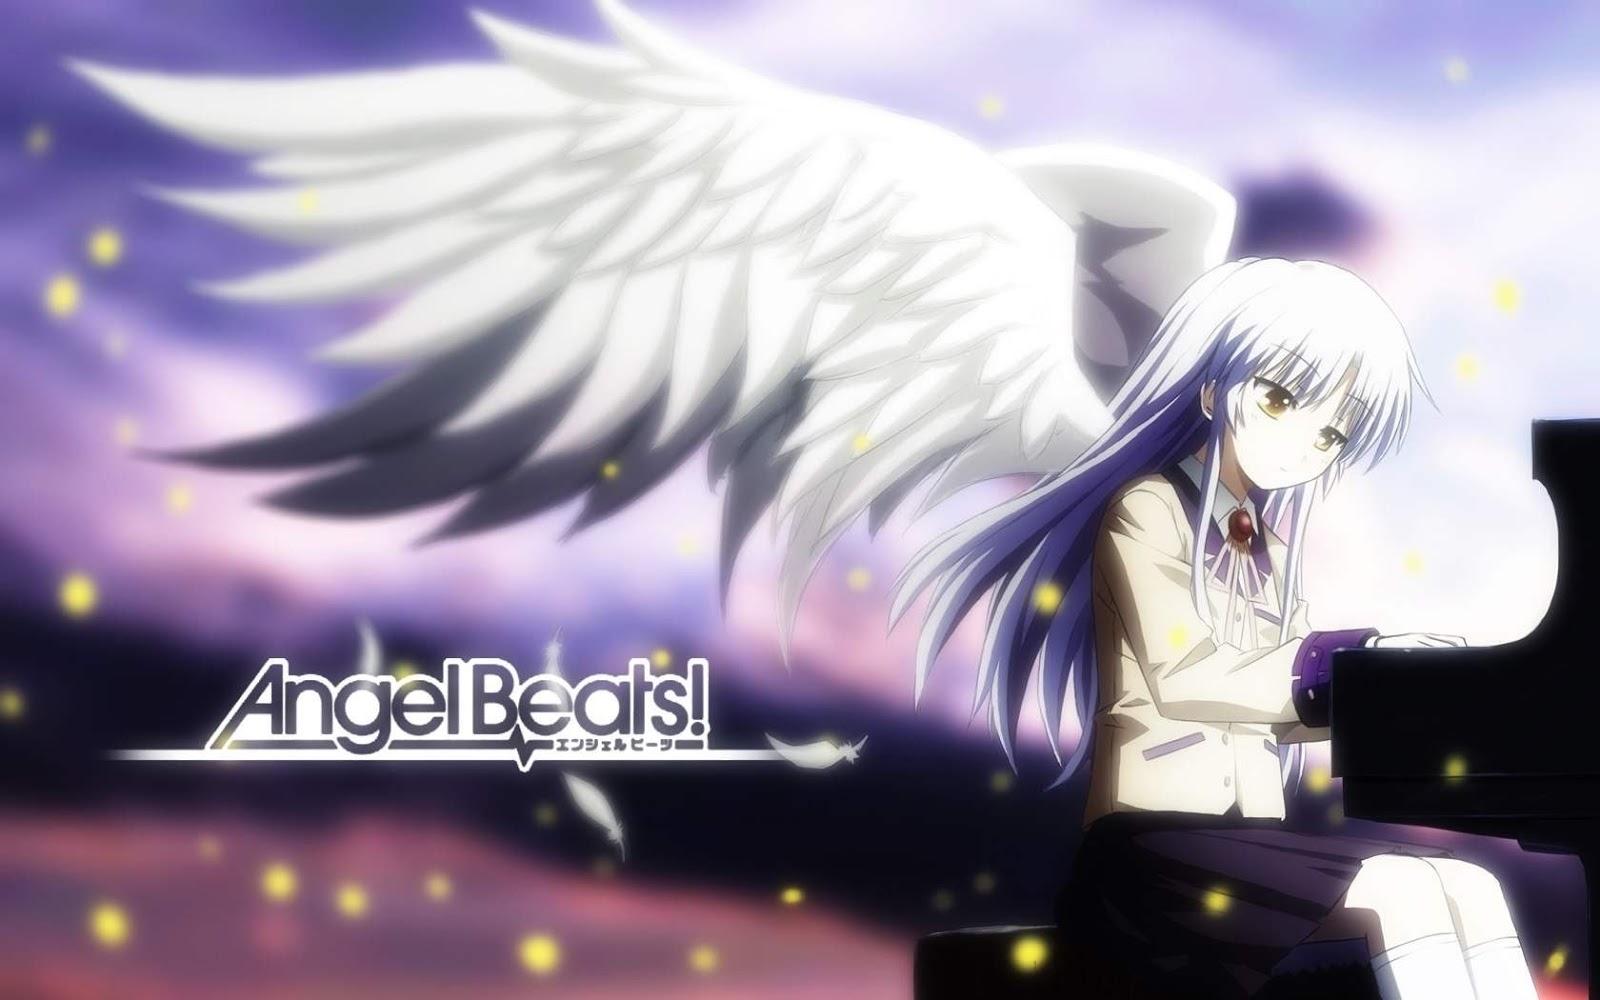 Siapa sih yg belum nonton angel beats ini salah satu alasan kenapa daima suka anime loh d dengan genre action comedy drama supernatural nya angel beats